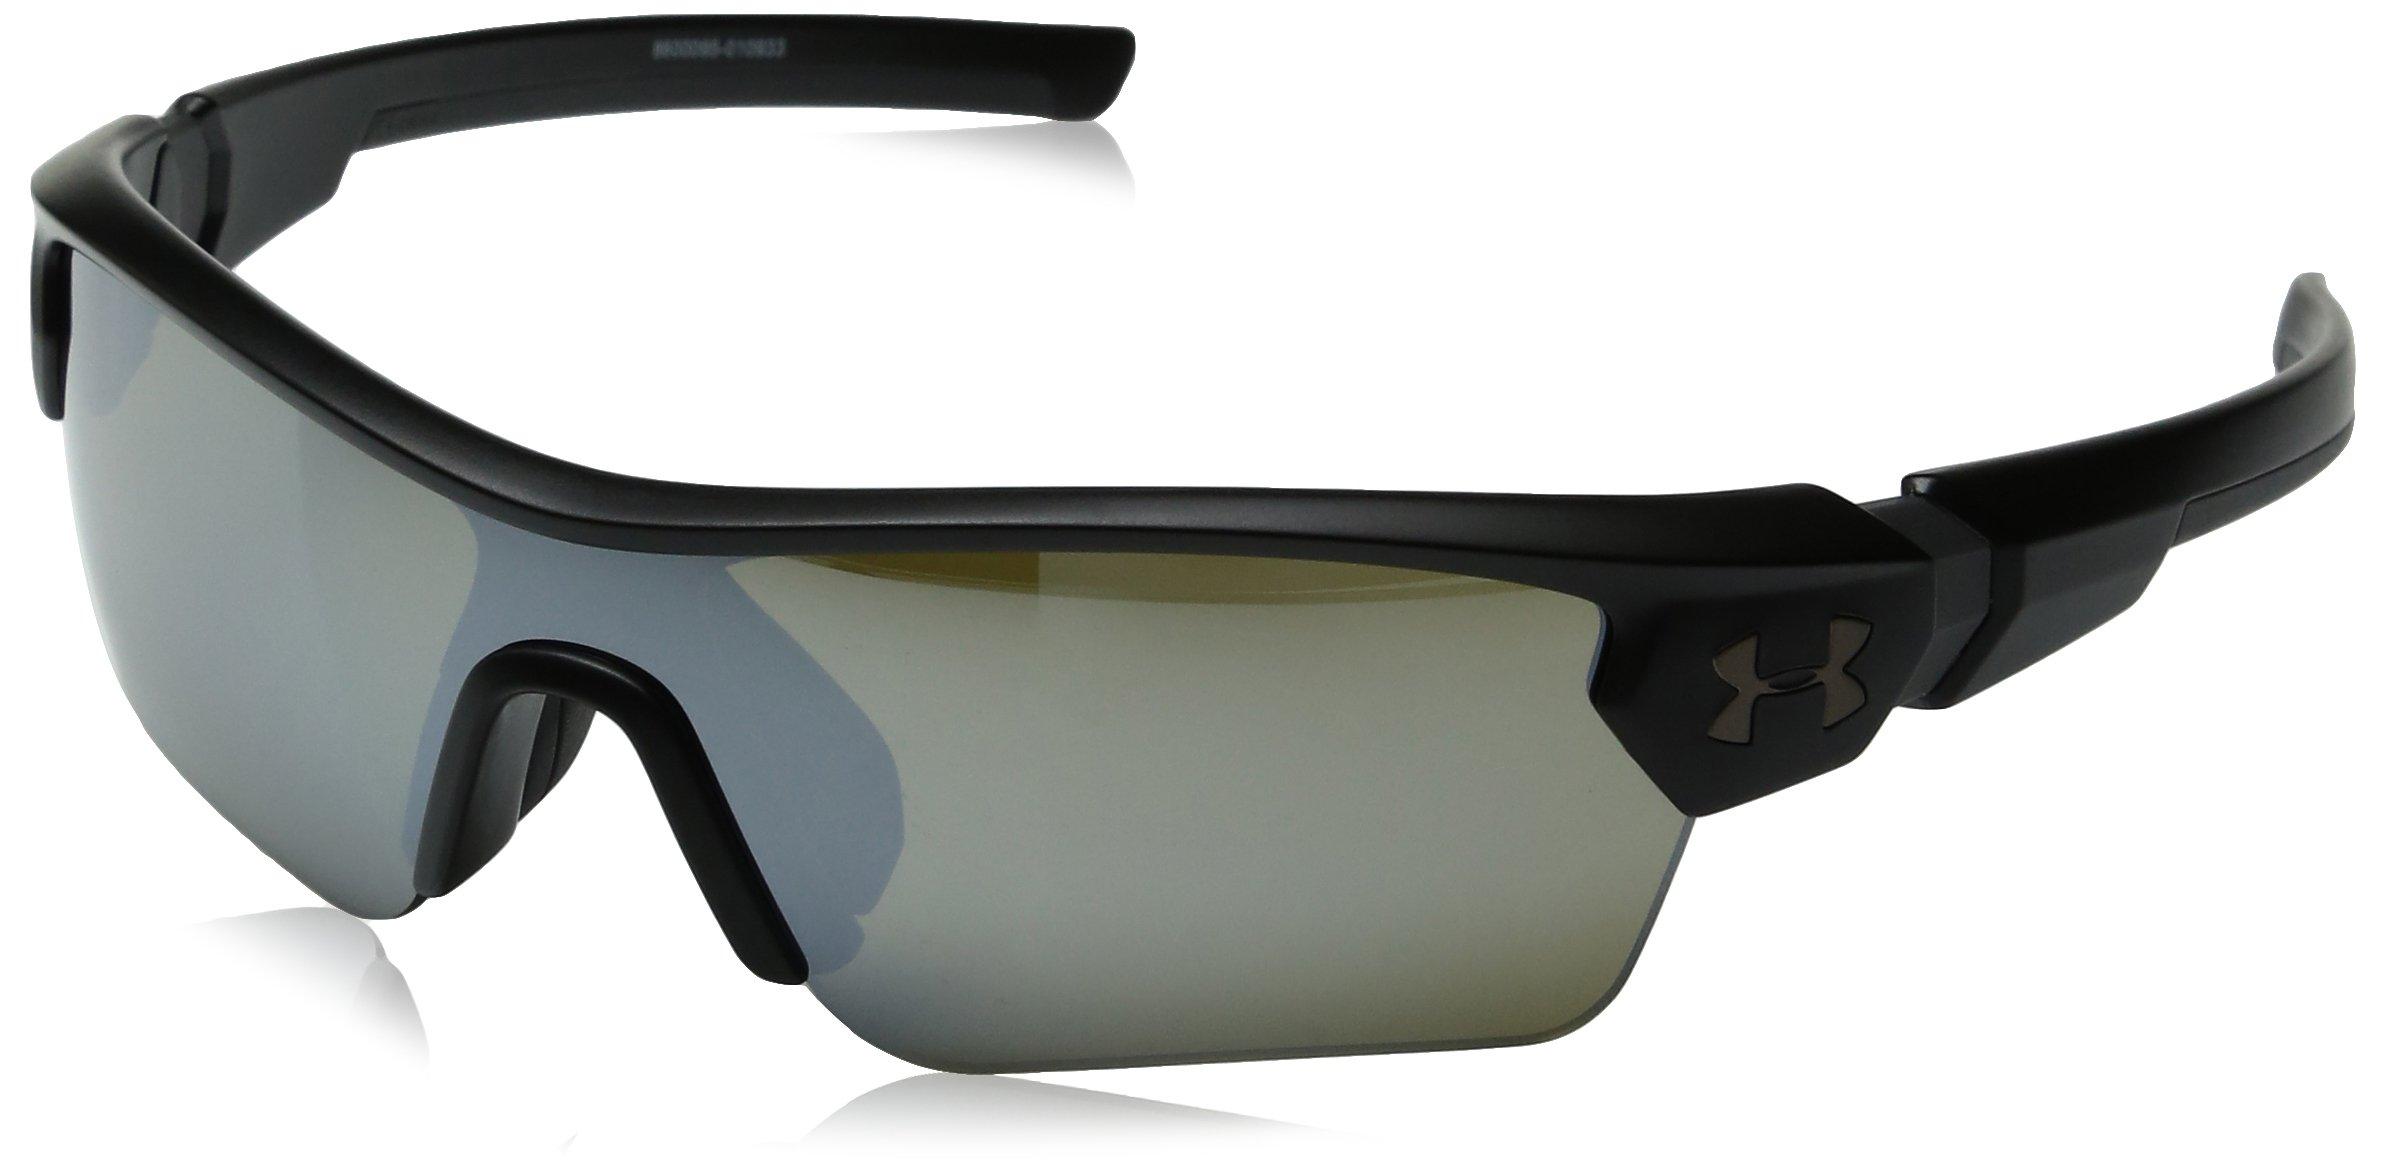 Under Armour Kids' Ua Menace Wrap Sunglasses, Black/Chrome, 58 mm